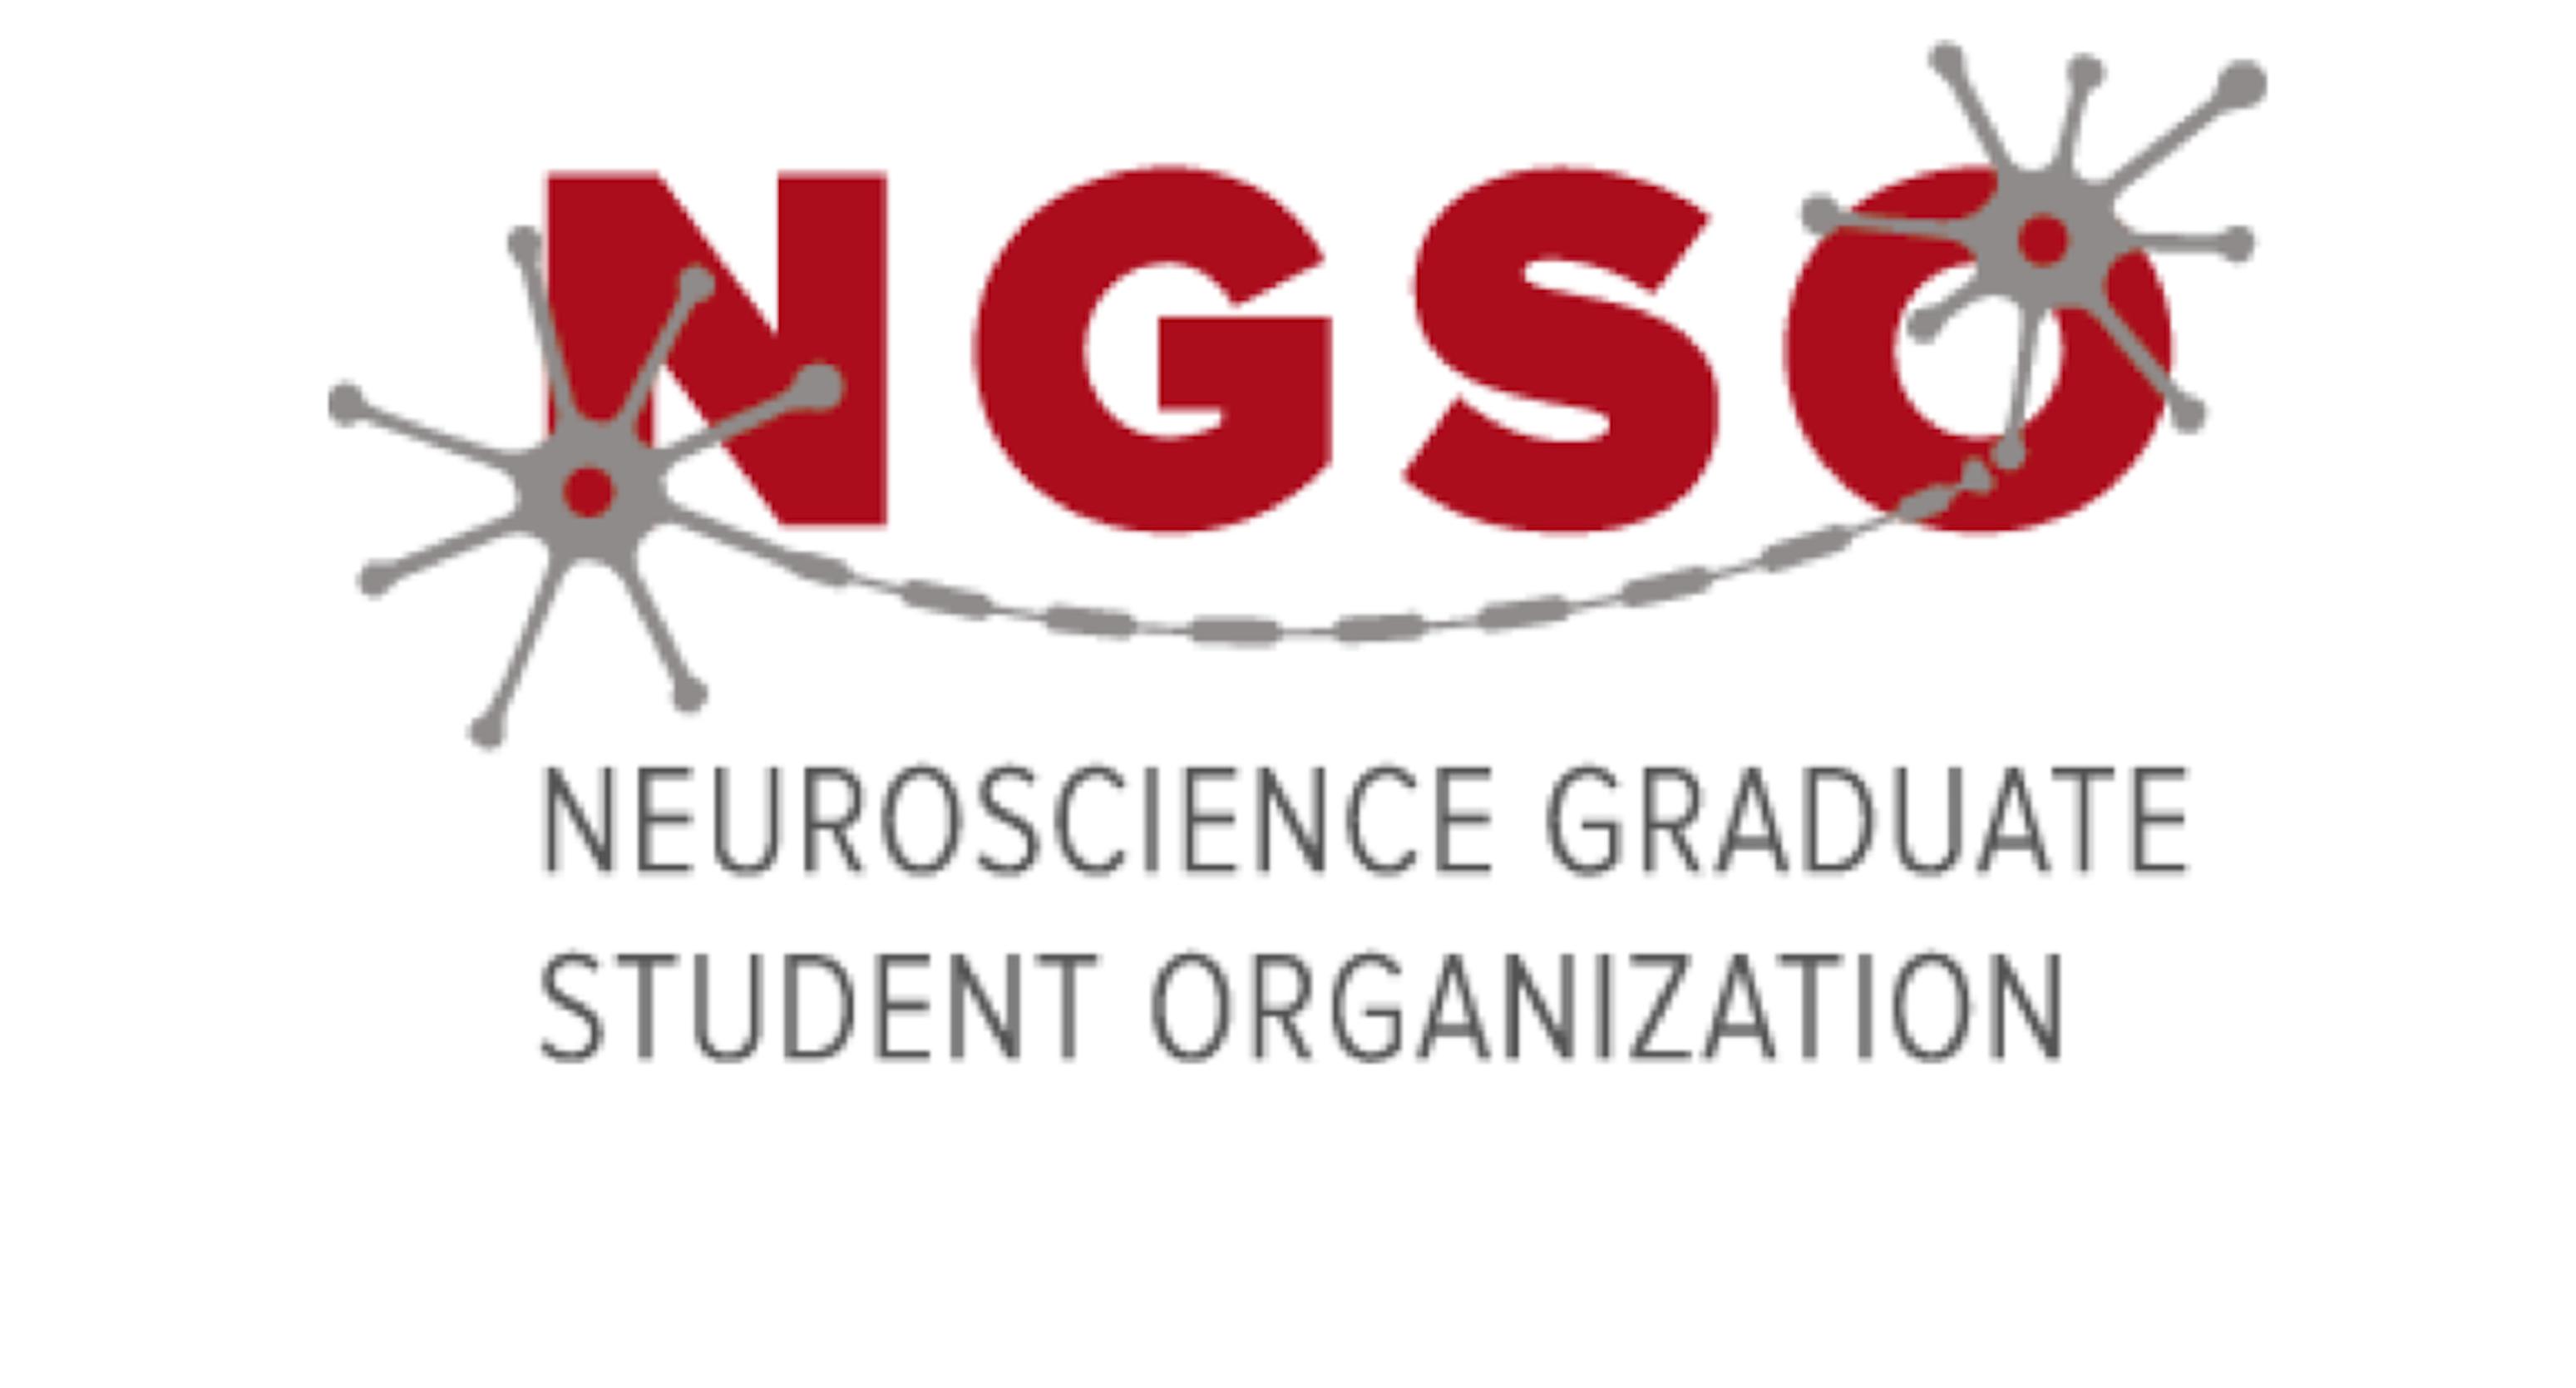 Neuroscience Graduate Student Organization